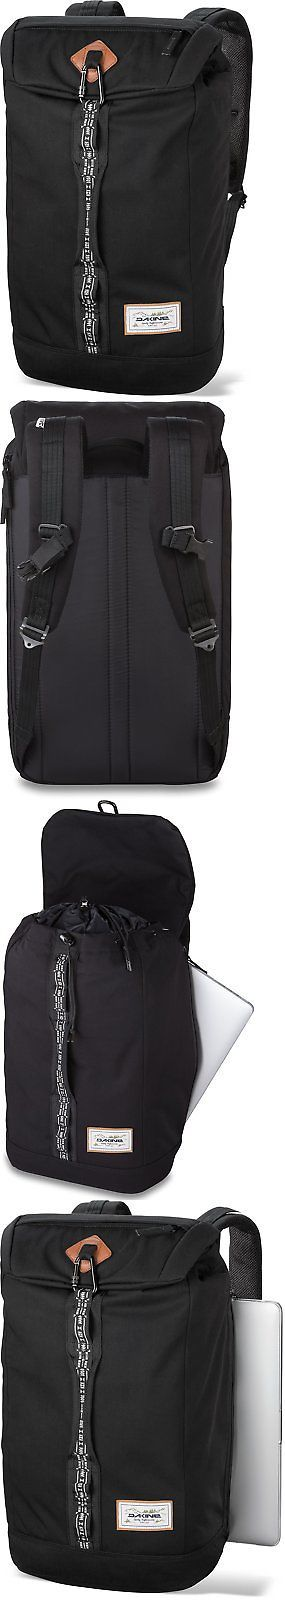 Other Skateboarding Clothing 159079: Dakine Rucksack Backpack, One Size 26 L, Black -> BUY IT NOW ONLY: $42.73 on eBay!